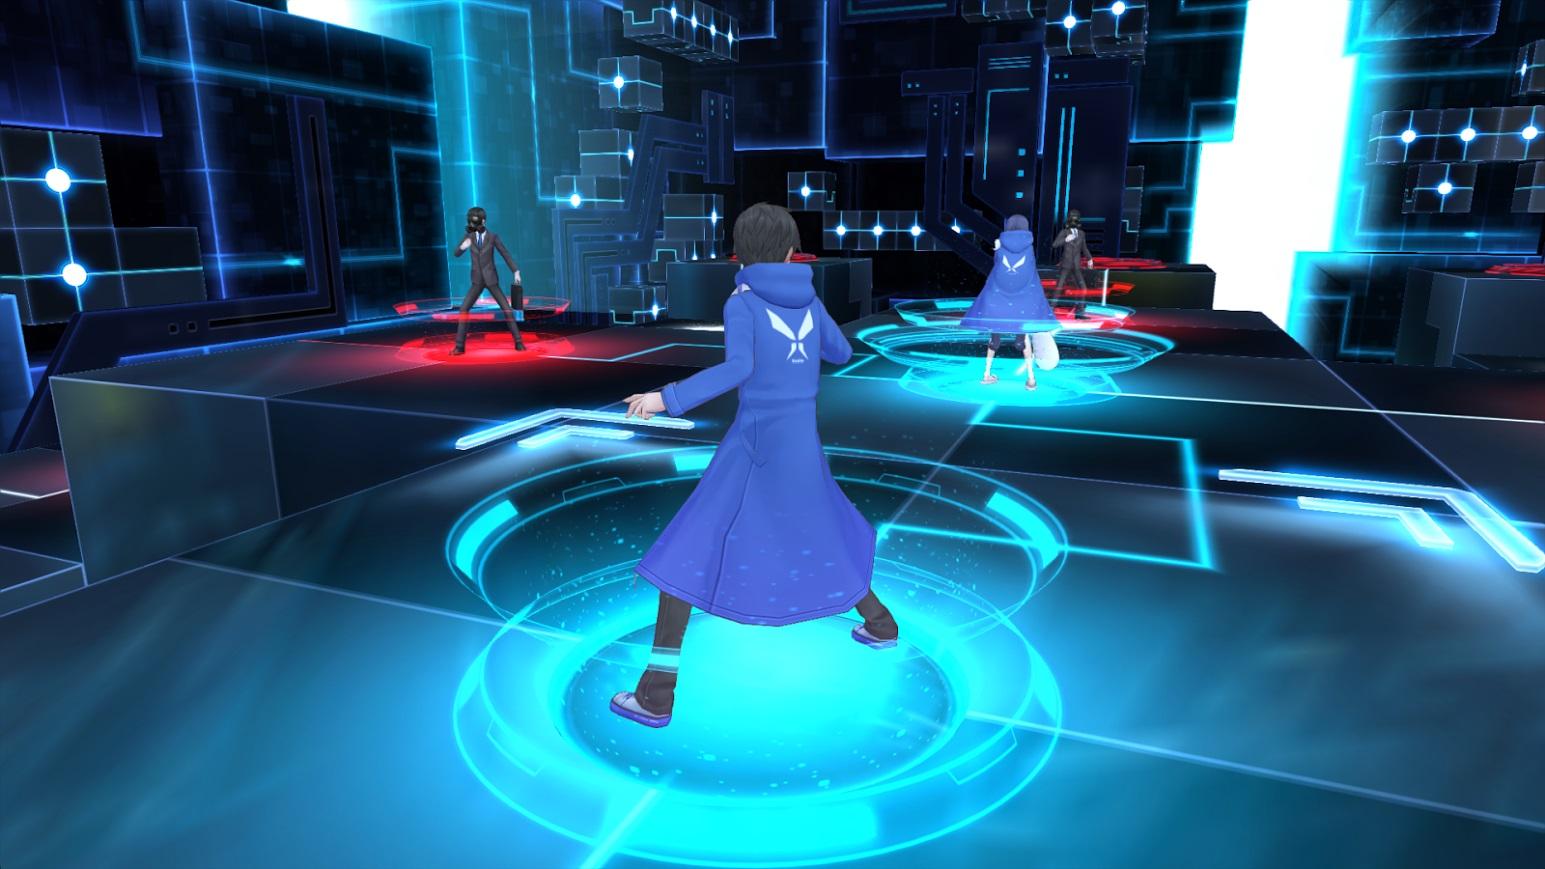 DigimonStory-CyberSleuthHacker-sMemory PS4 Editeur 013